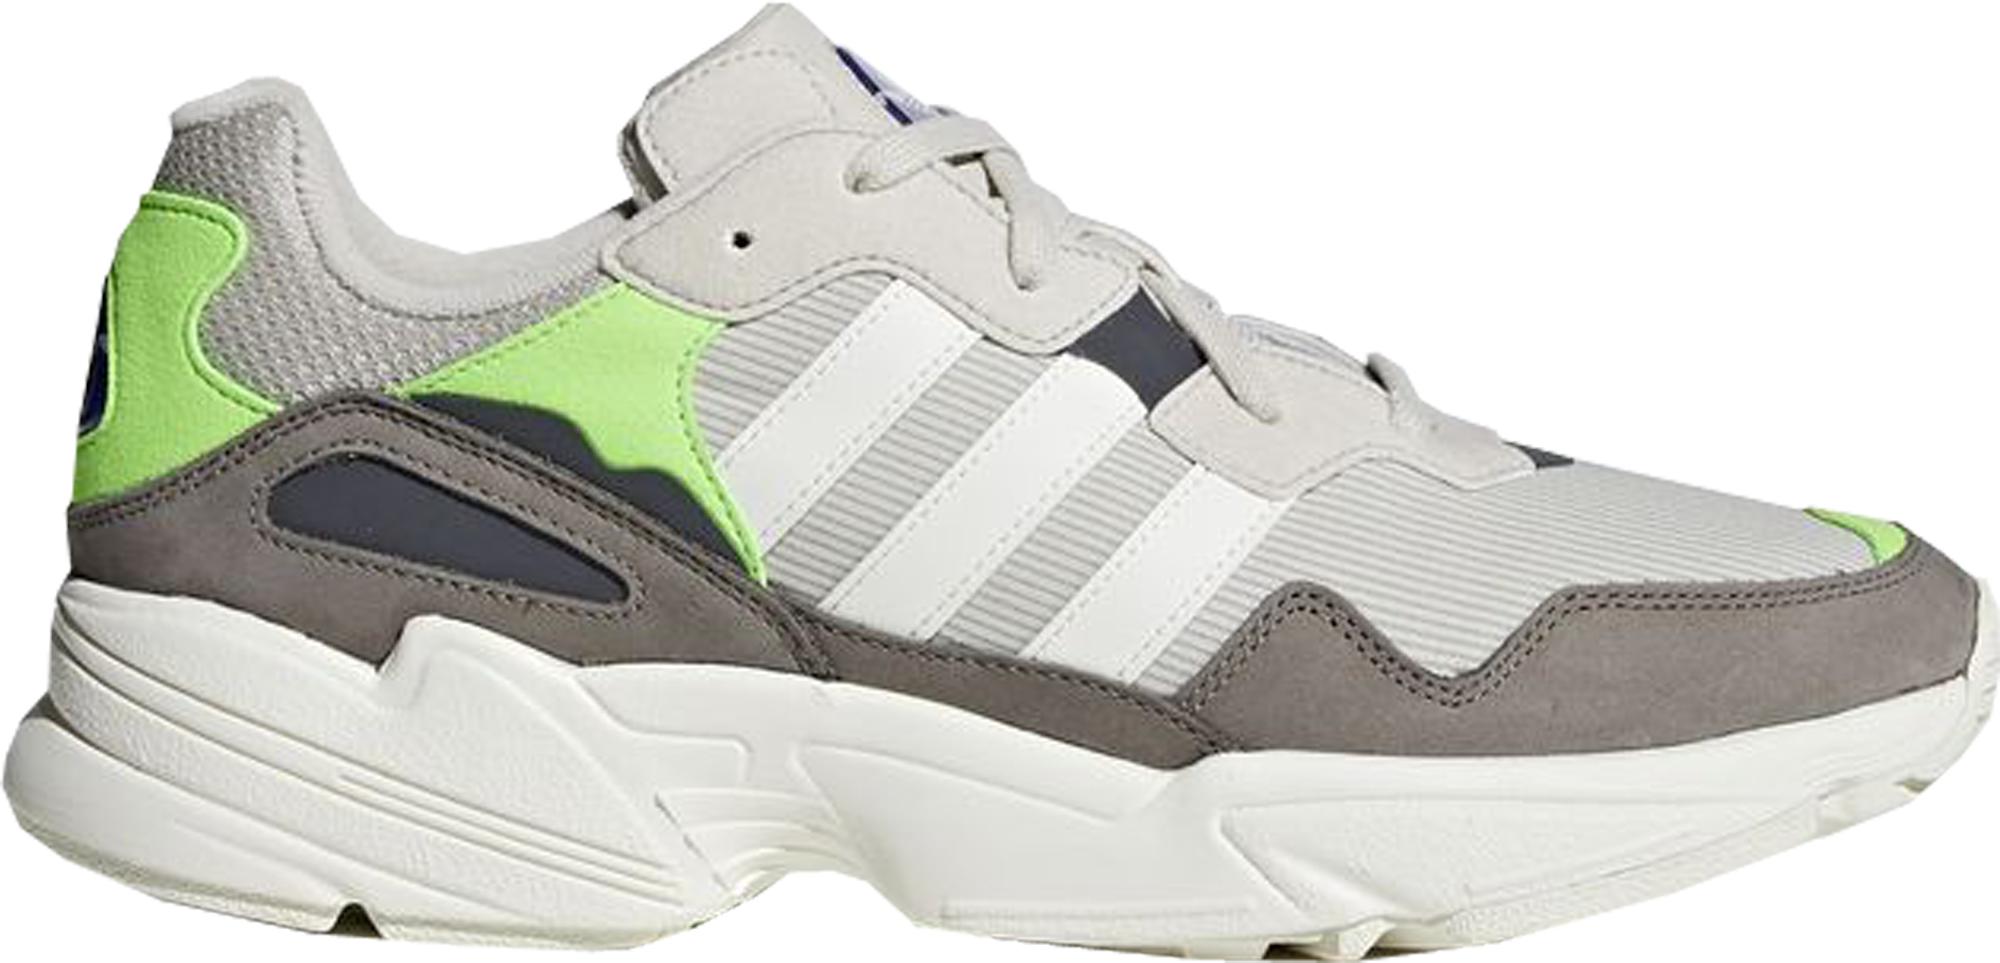 adidas Yung-96 Off White Solar Green